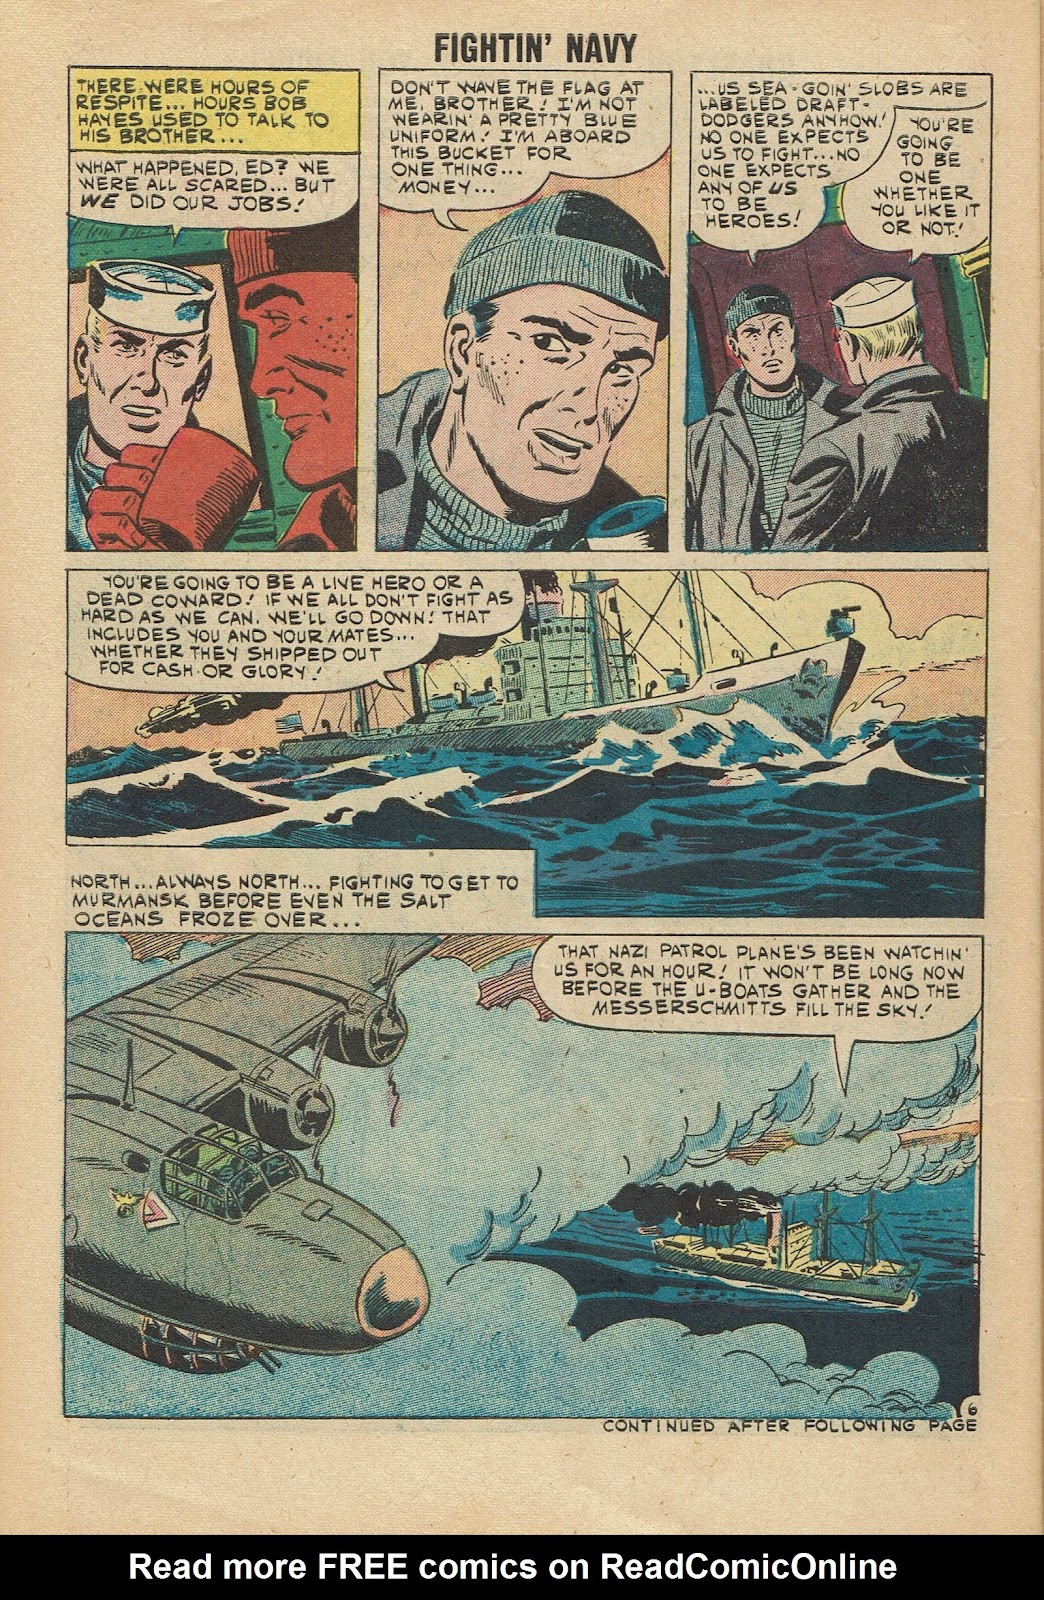 Read online Fightin' Navy comic -  Issue #96 - 30